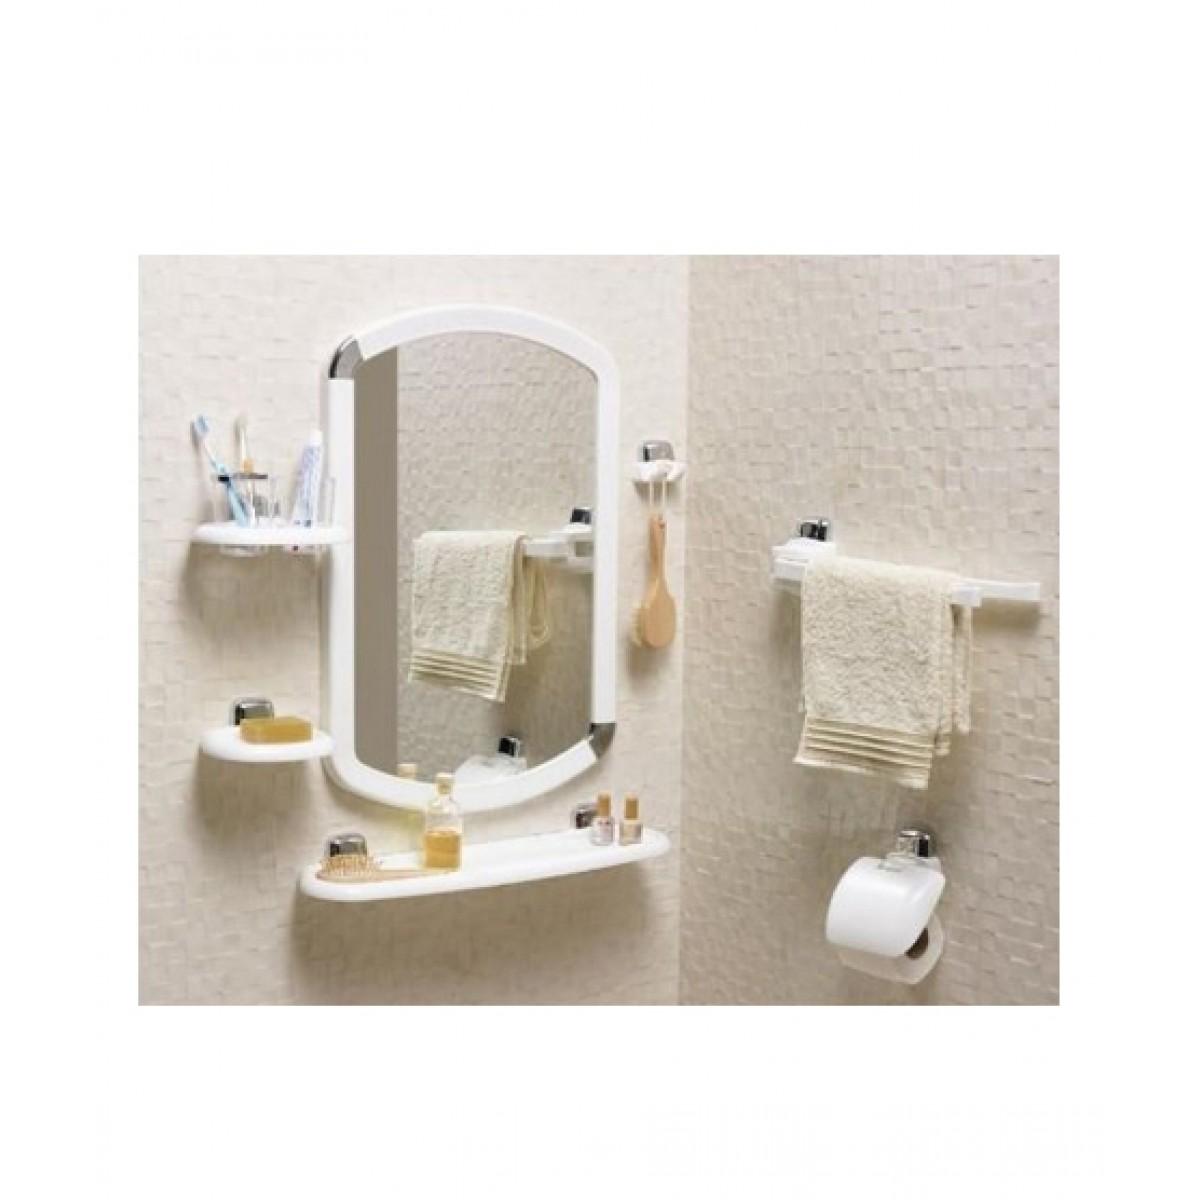 Primanova Bathroom Mirror Set 7 Pieces White (24010)